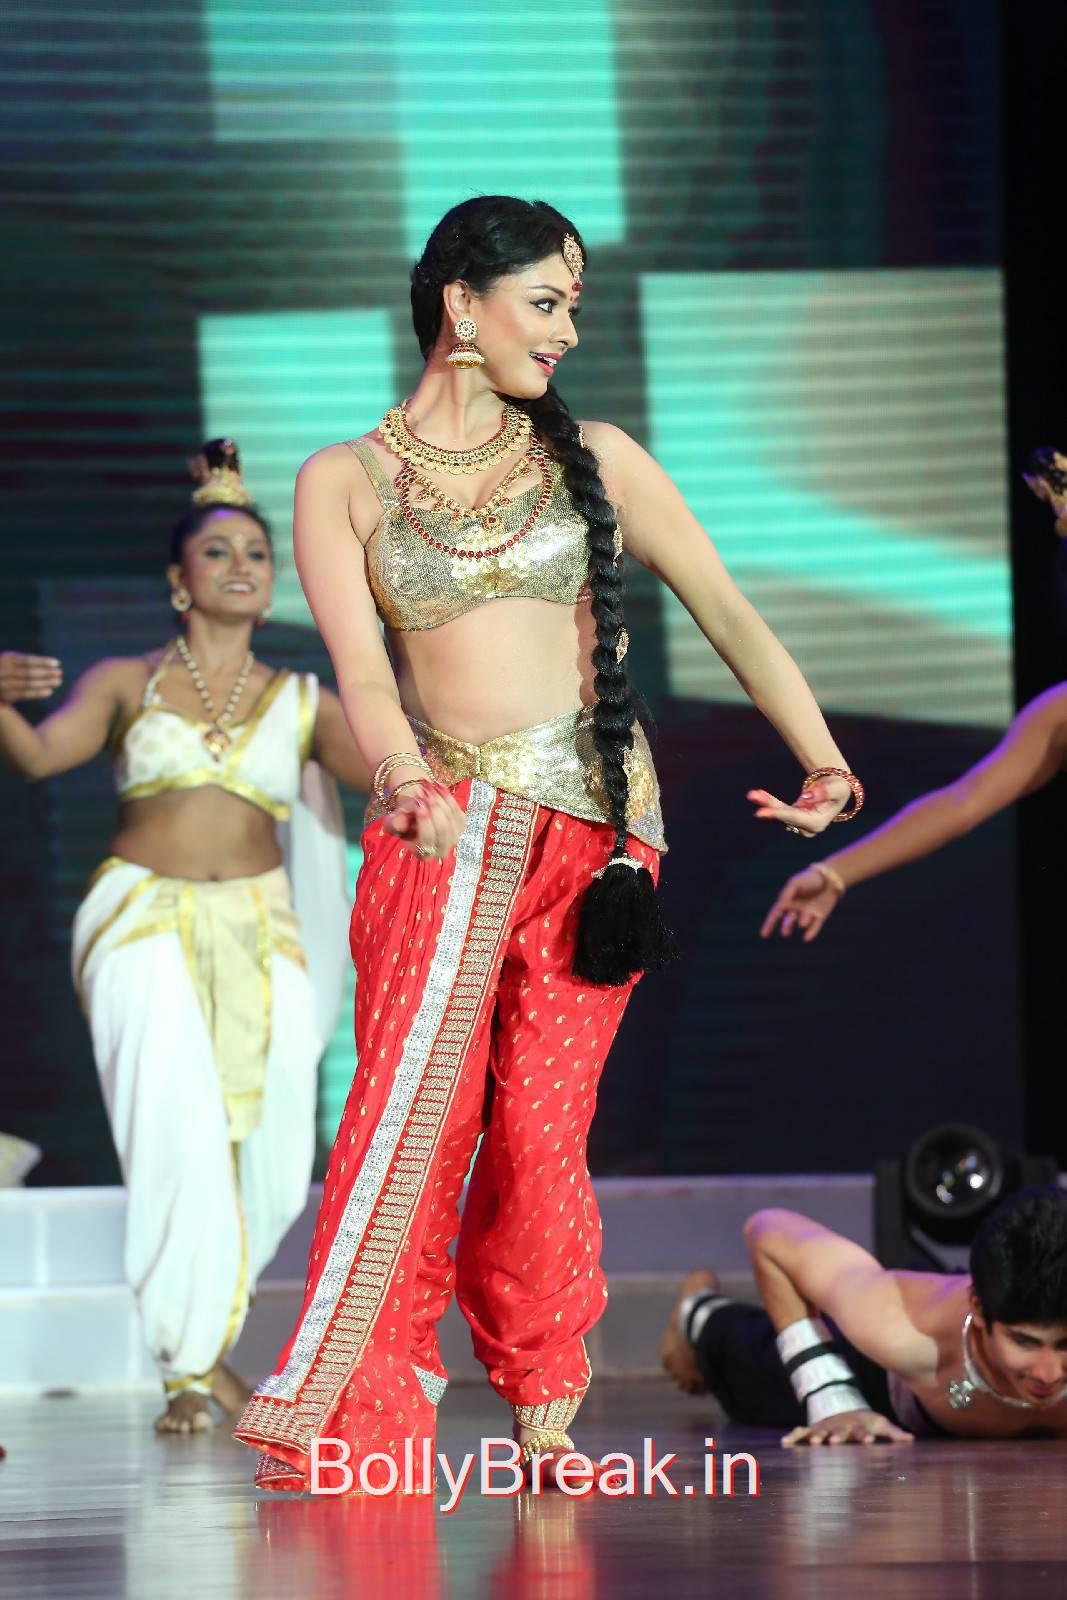 High Quality Pooja Kumar Pics, Actress Pooja Kumar Hot Dancing Pics at  Uttama Villain Movie Aduio Launch